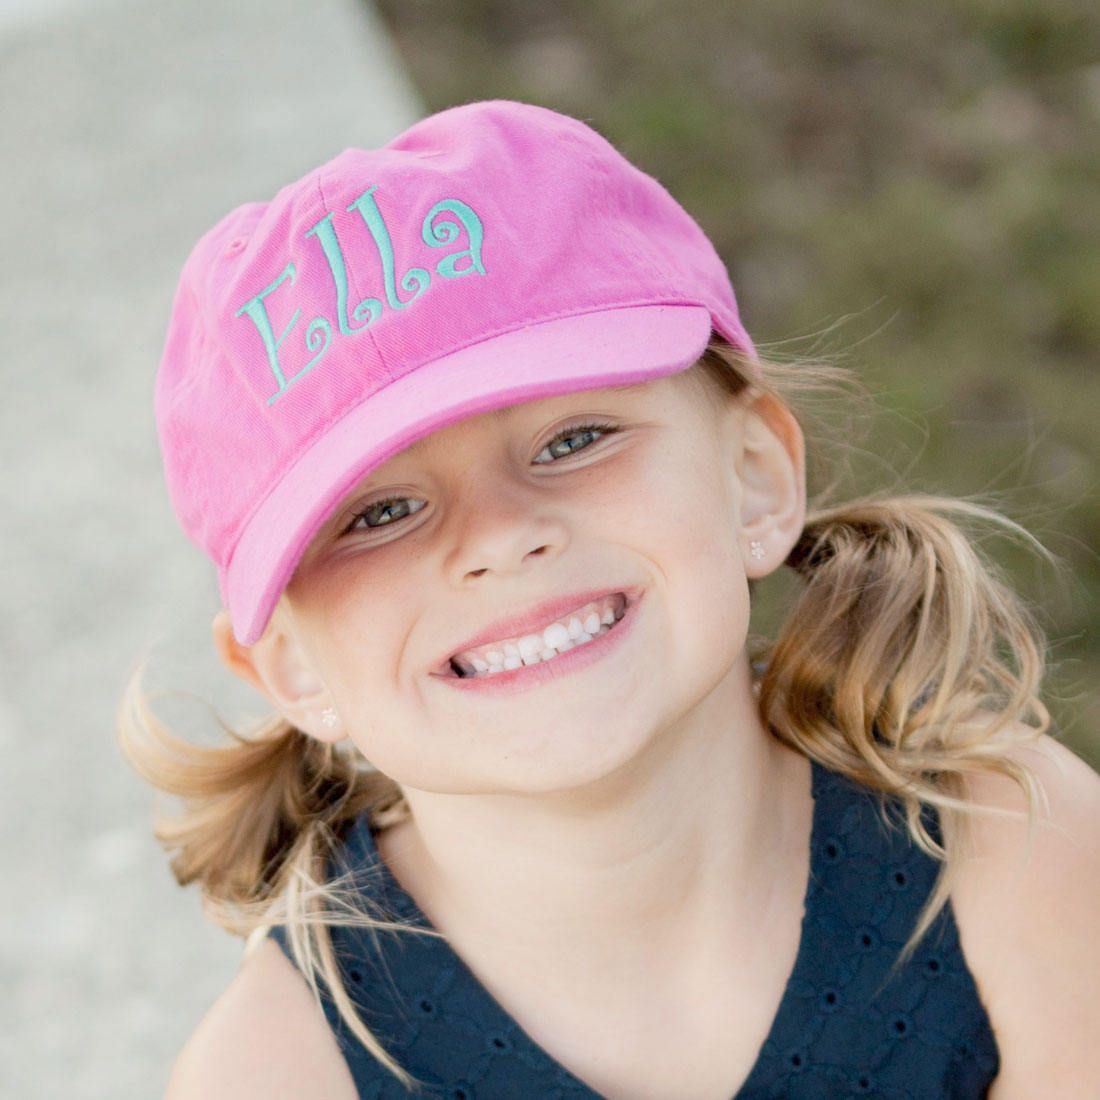 1510e8c9b48 Girl s Pink Cap - Baseball Cap - Monogram Cap - Girl s Hat - Personalized  Cap - Girl s Baseball Cap - Girl s Cap - Pink Cap - Girls Gift by ...